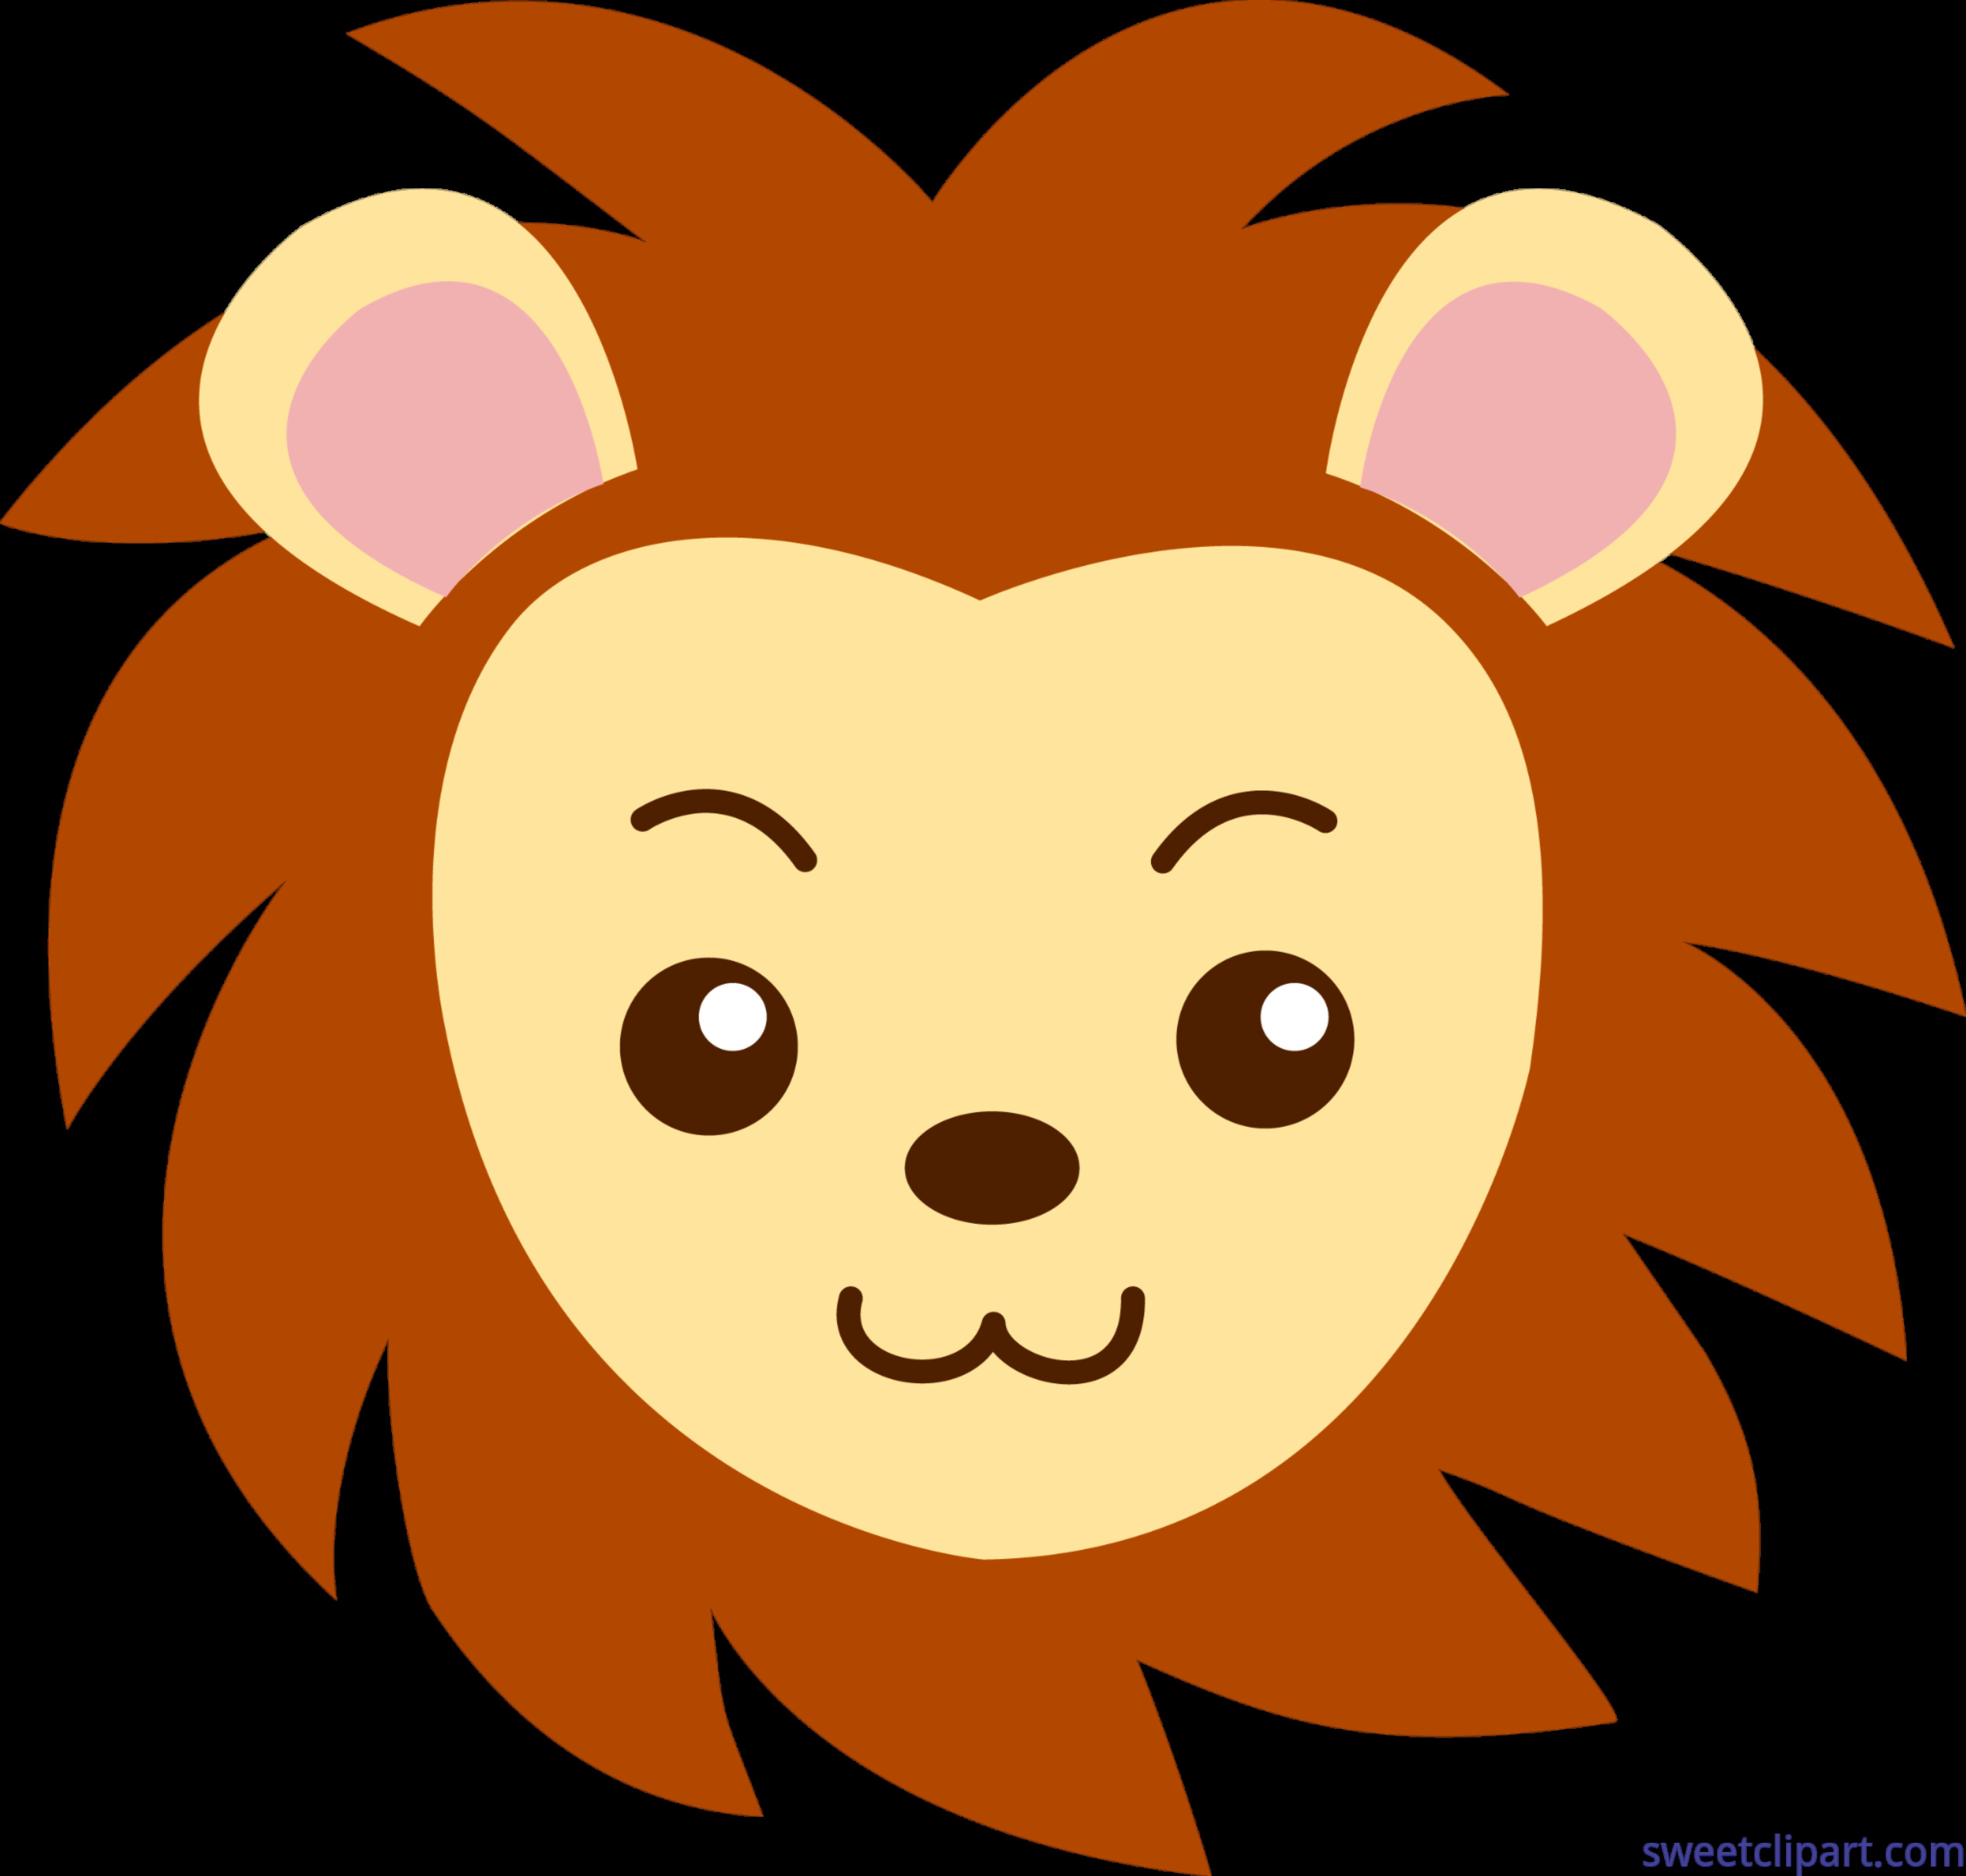 Clipart box face. Lion clip art sweet